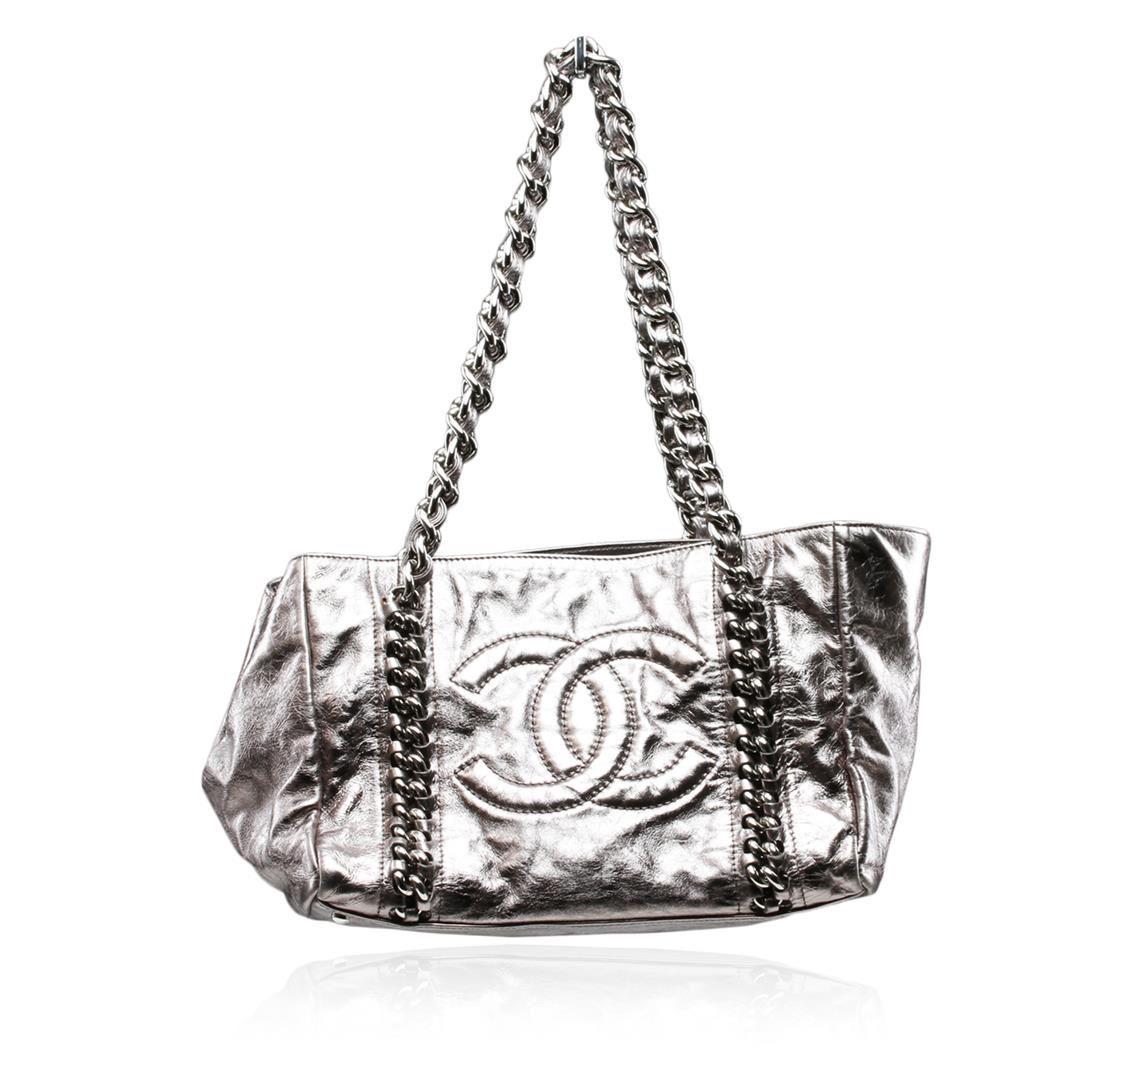 70a7a99071e0 Image 1 : Chanel Silver Metallic Cracked Calfskin Modern Chain Tote ...